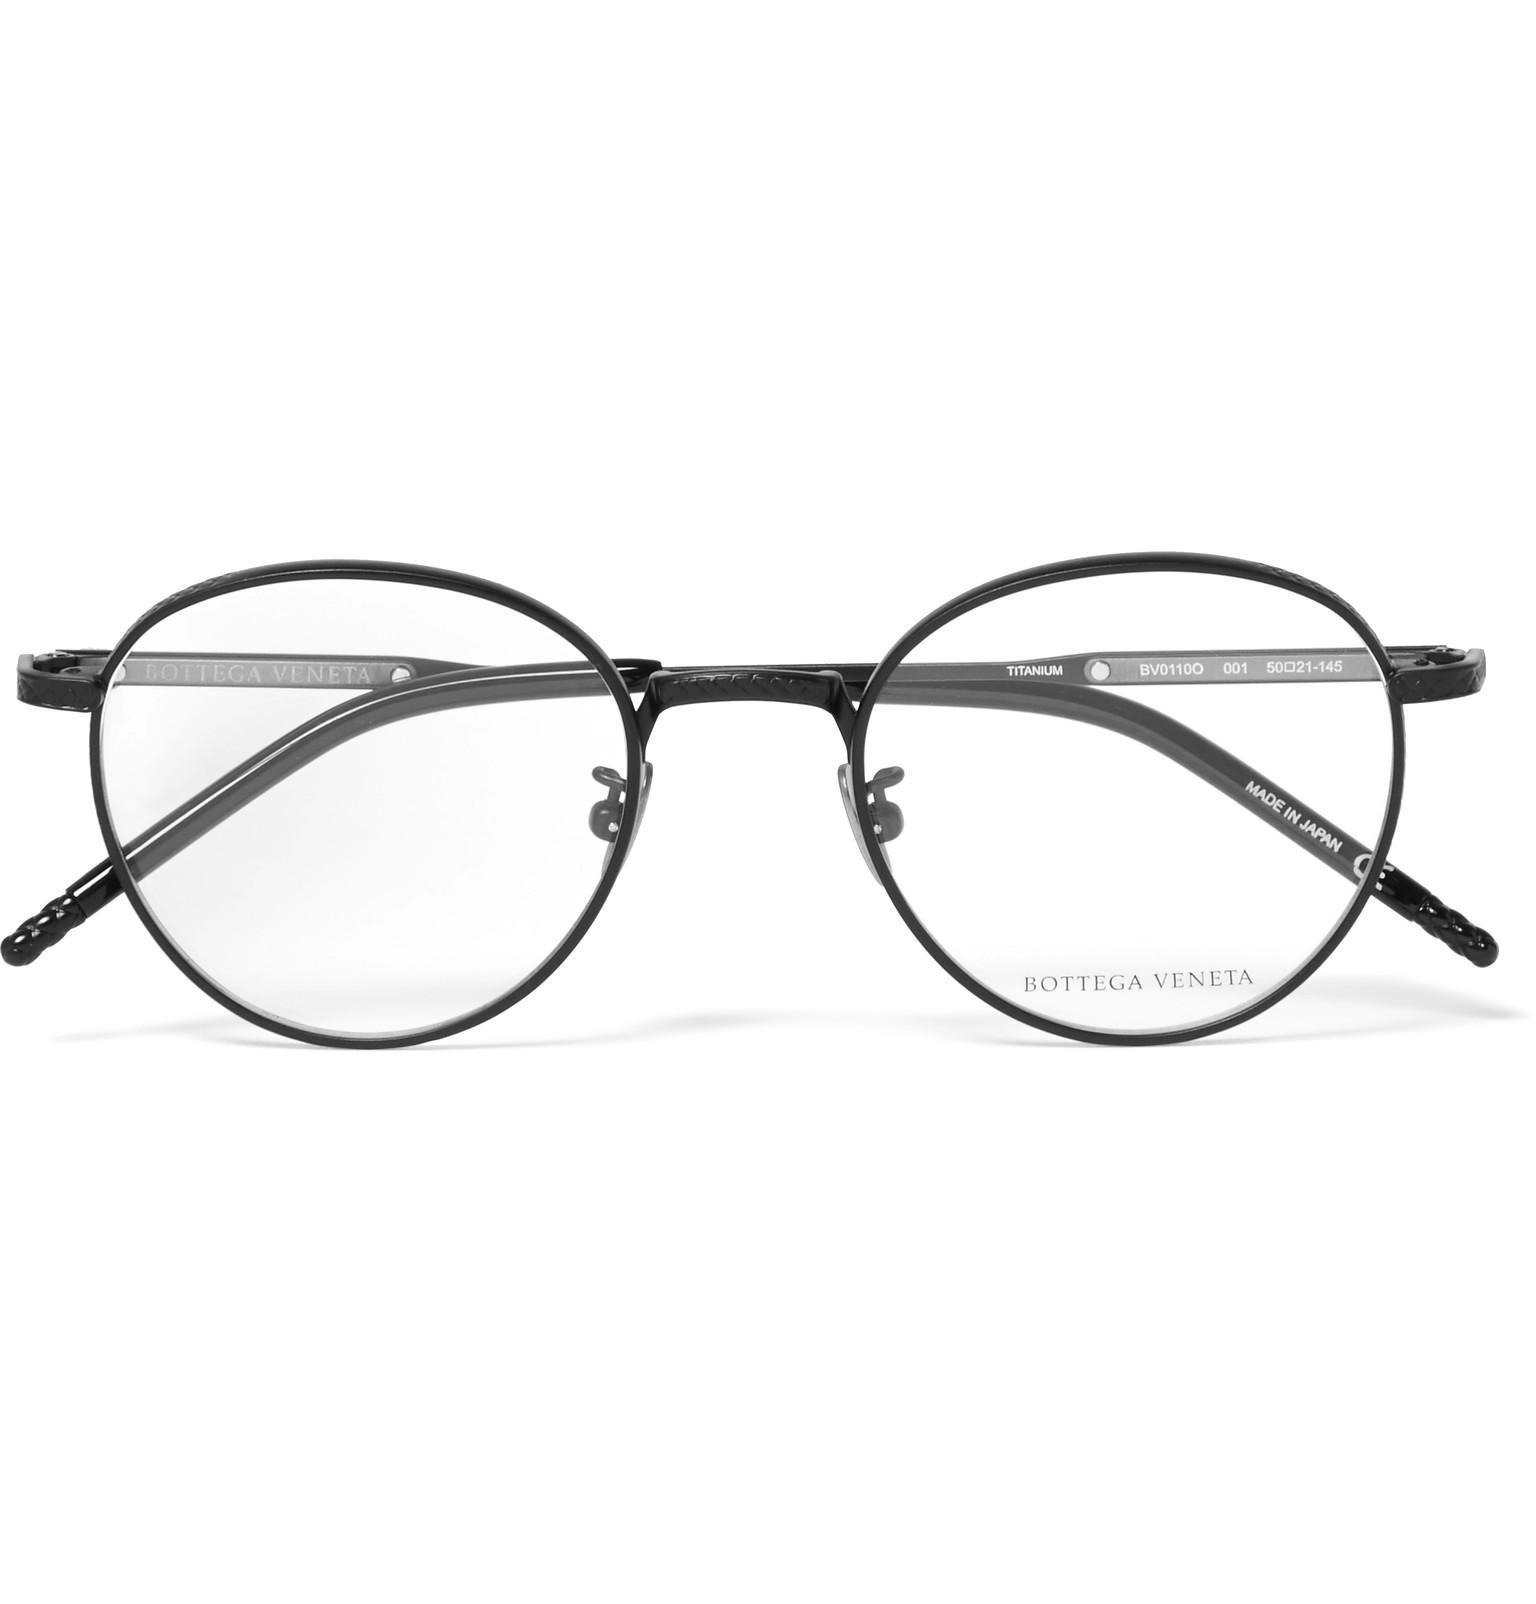 7a34150f6 Bottega Veneta Round-frame Titanium And Acetate Optical Glasses in ...